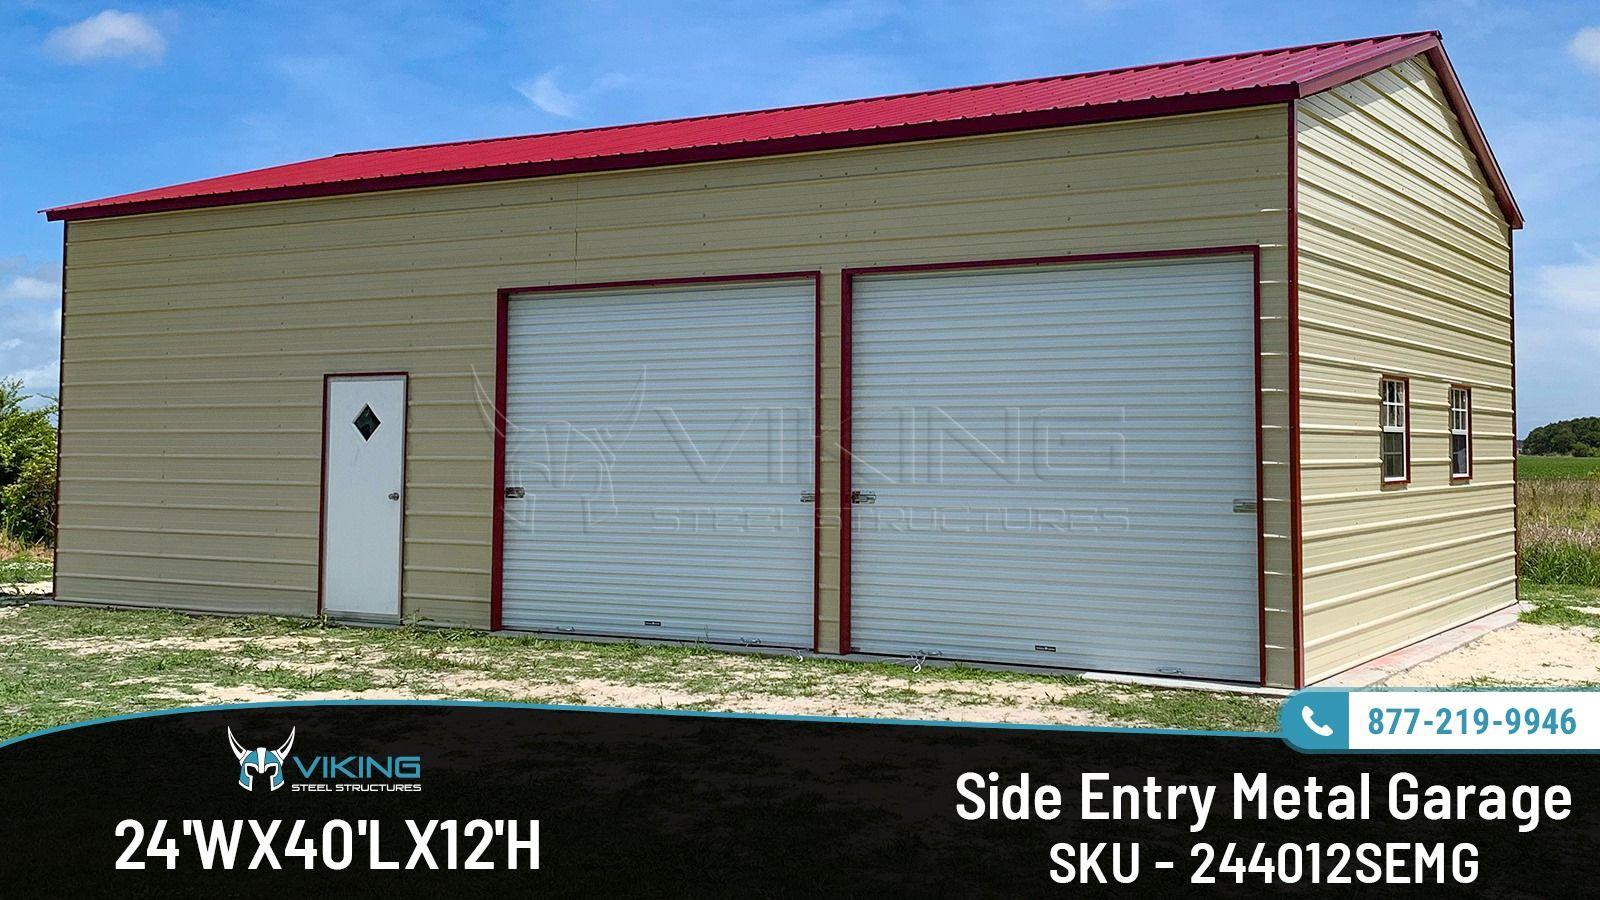 24 W X 40 L X 12 H Side Entry Metal Garage Metal Garages Garage Entry